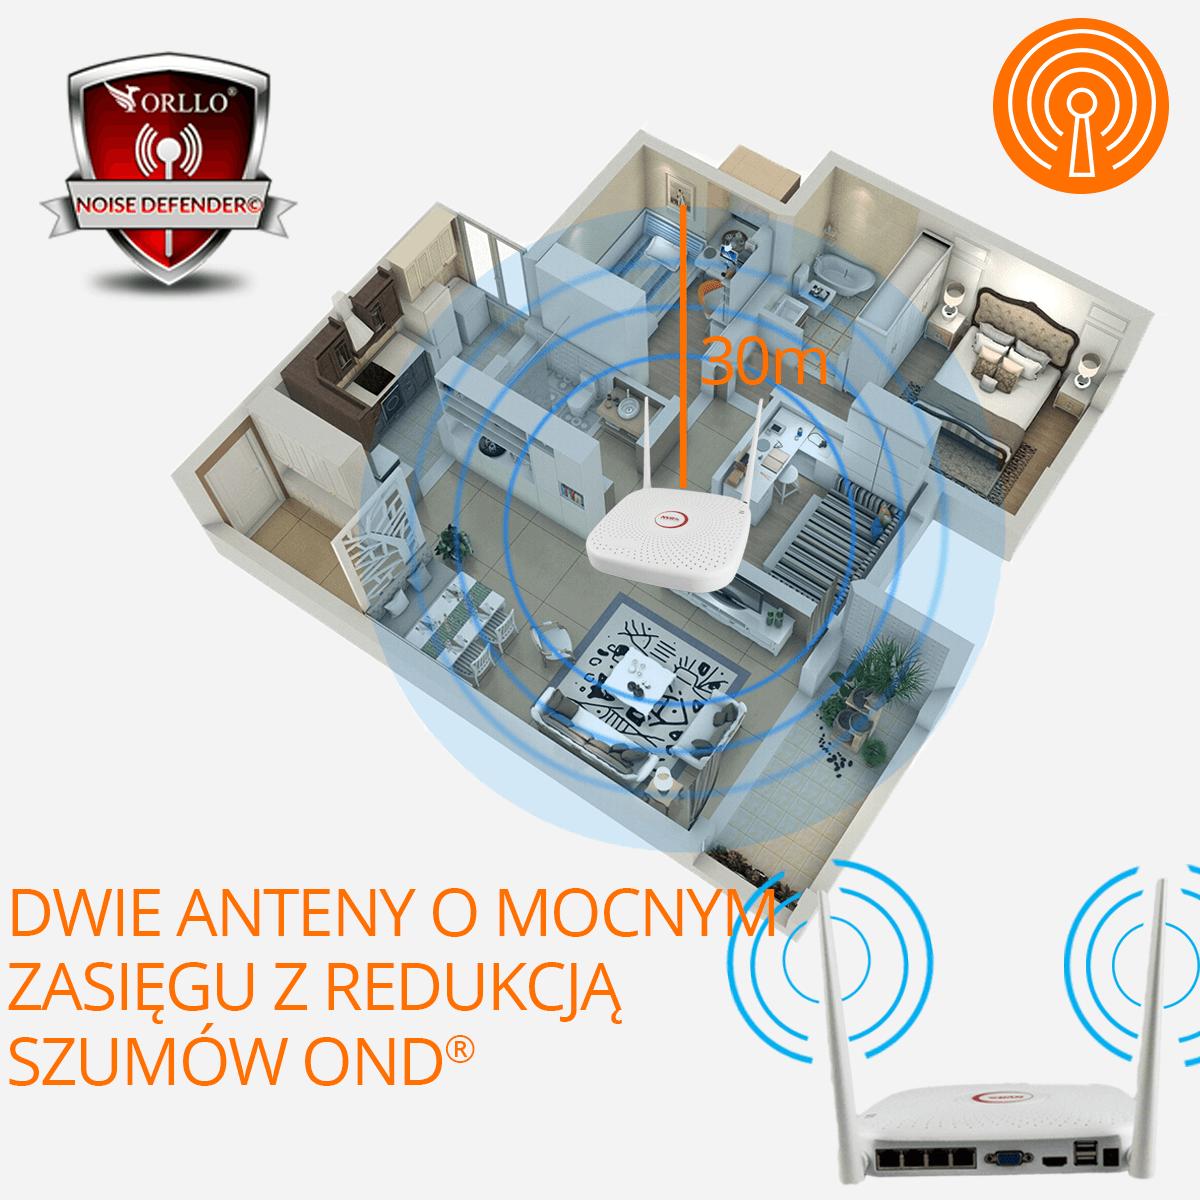 Zestaw-do-monitoringu-CAMSET-dwieanteny-orllo-pl